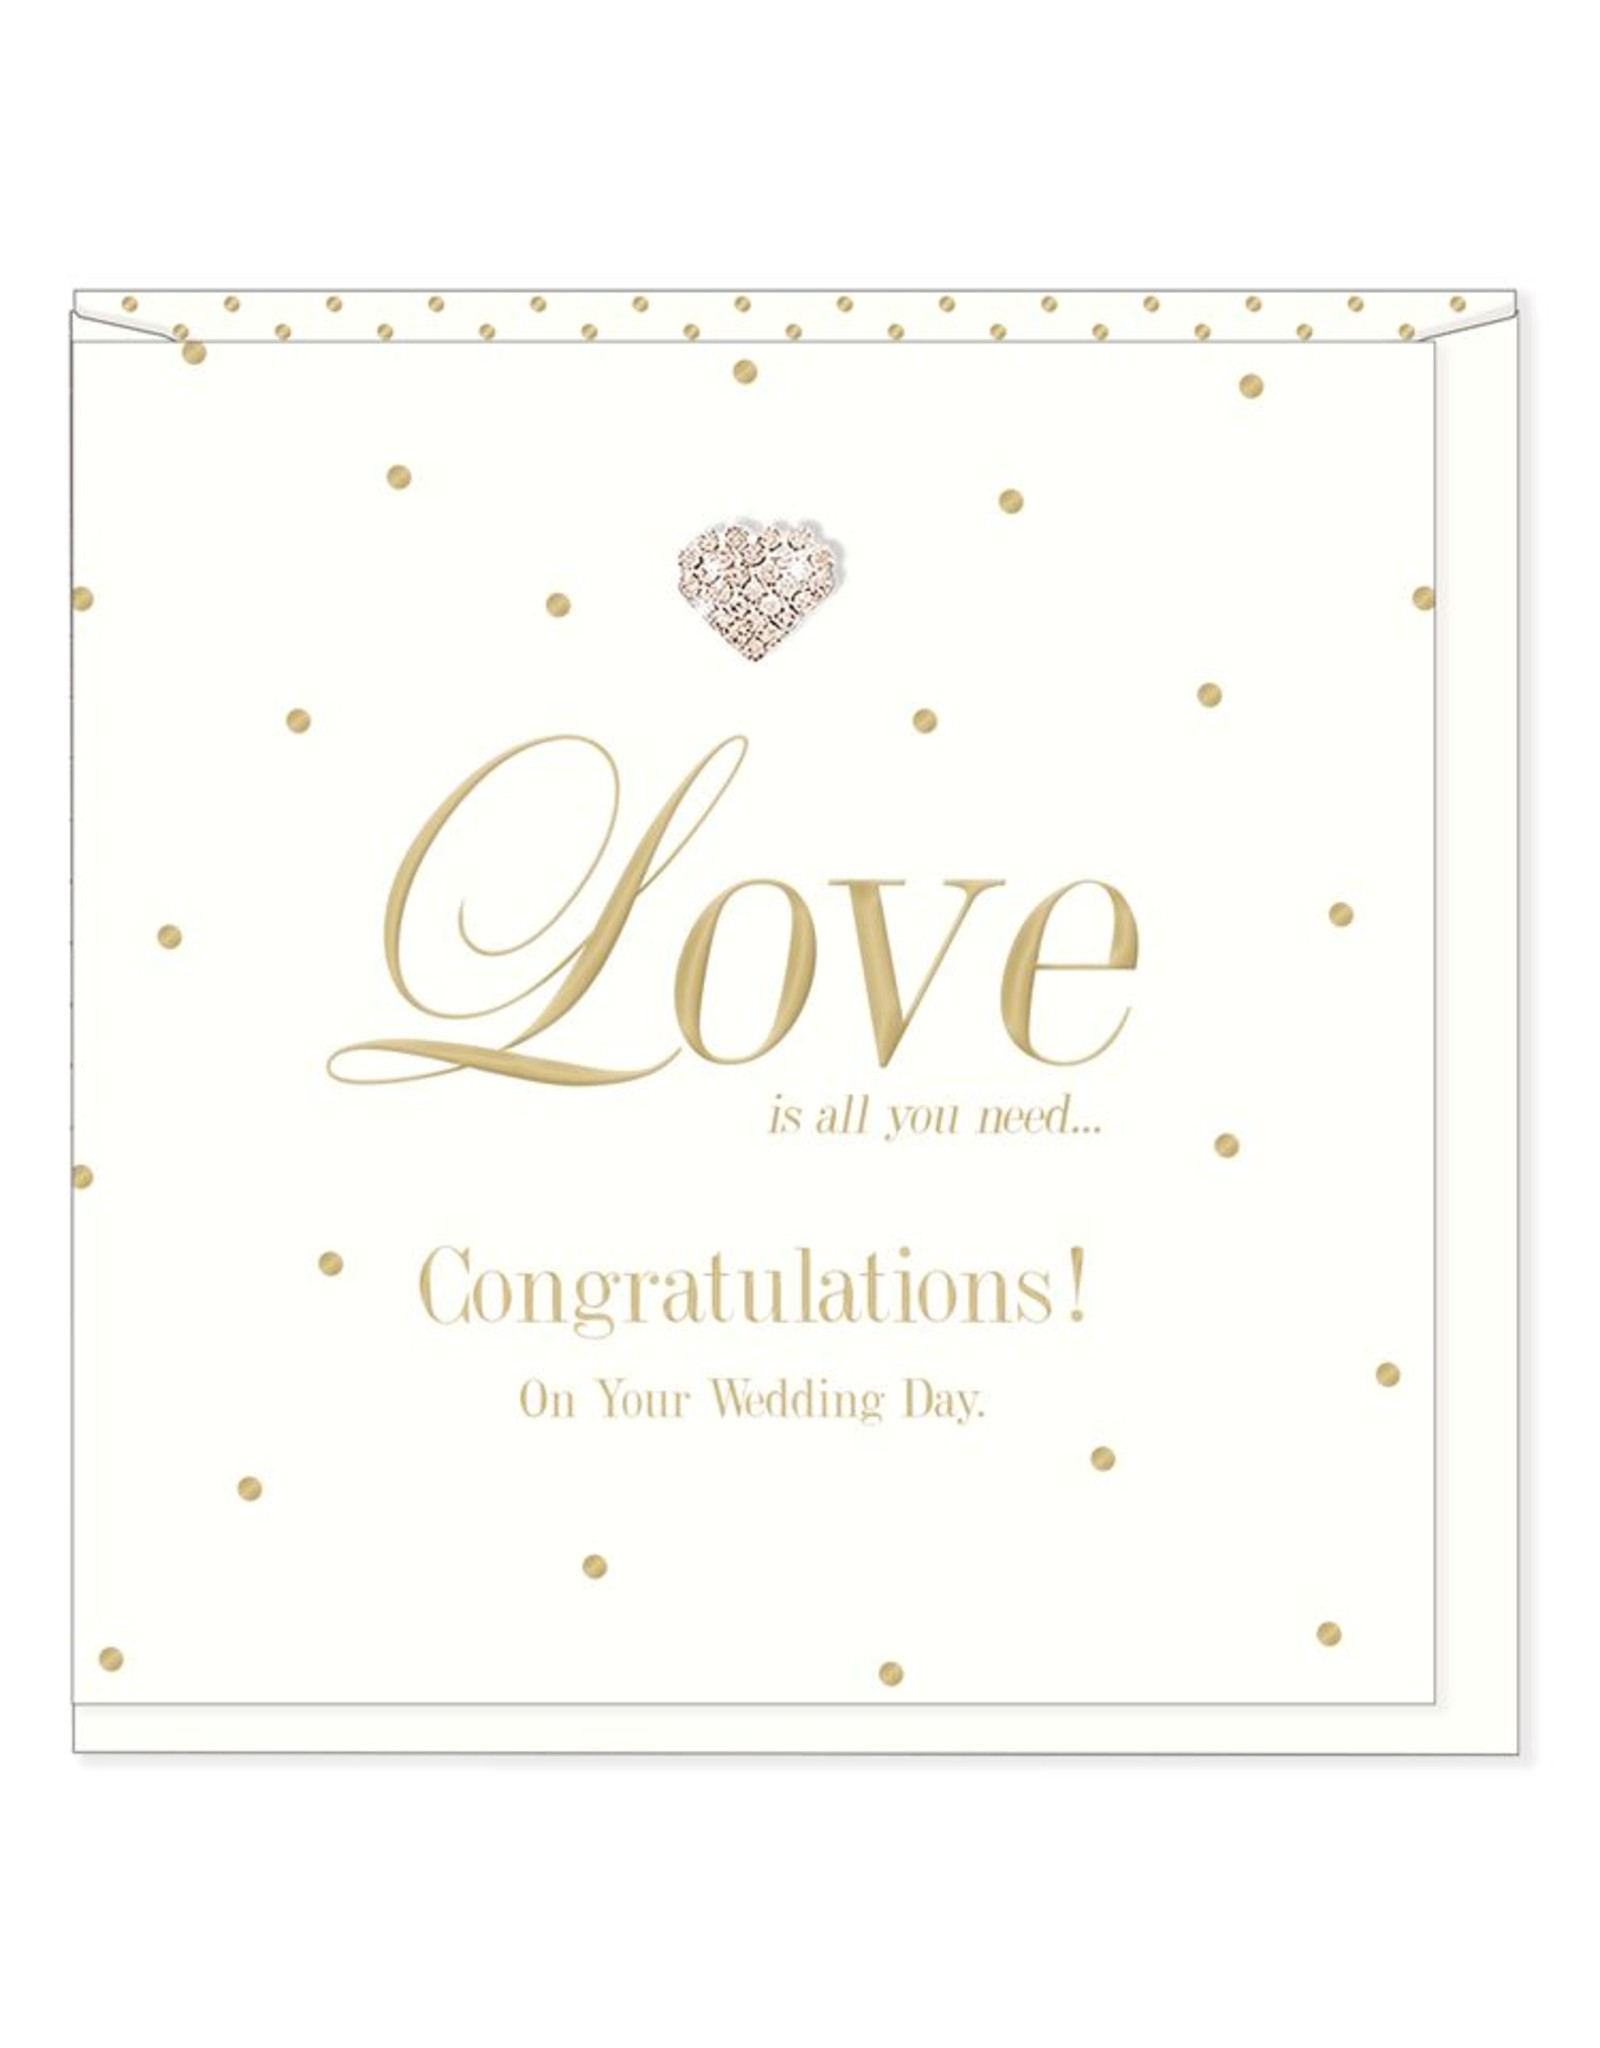 Hearts Design Wenskaart - Congratulations on your Wedding Day